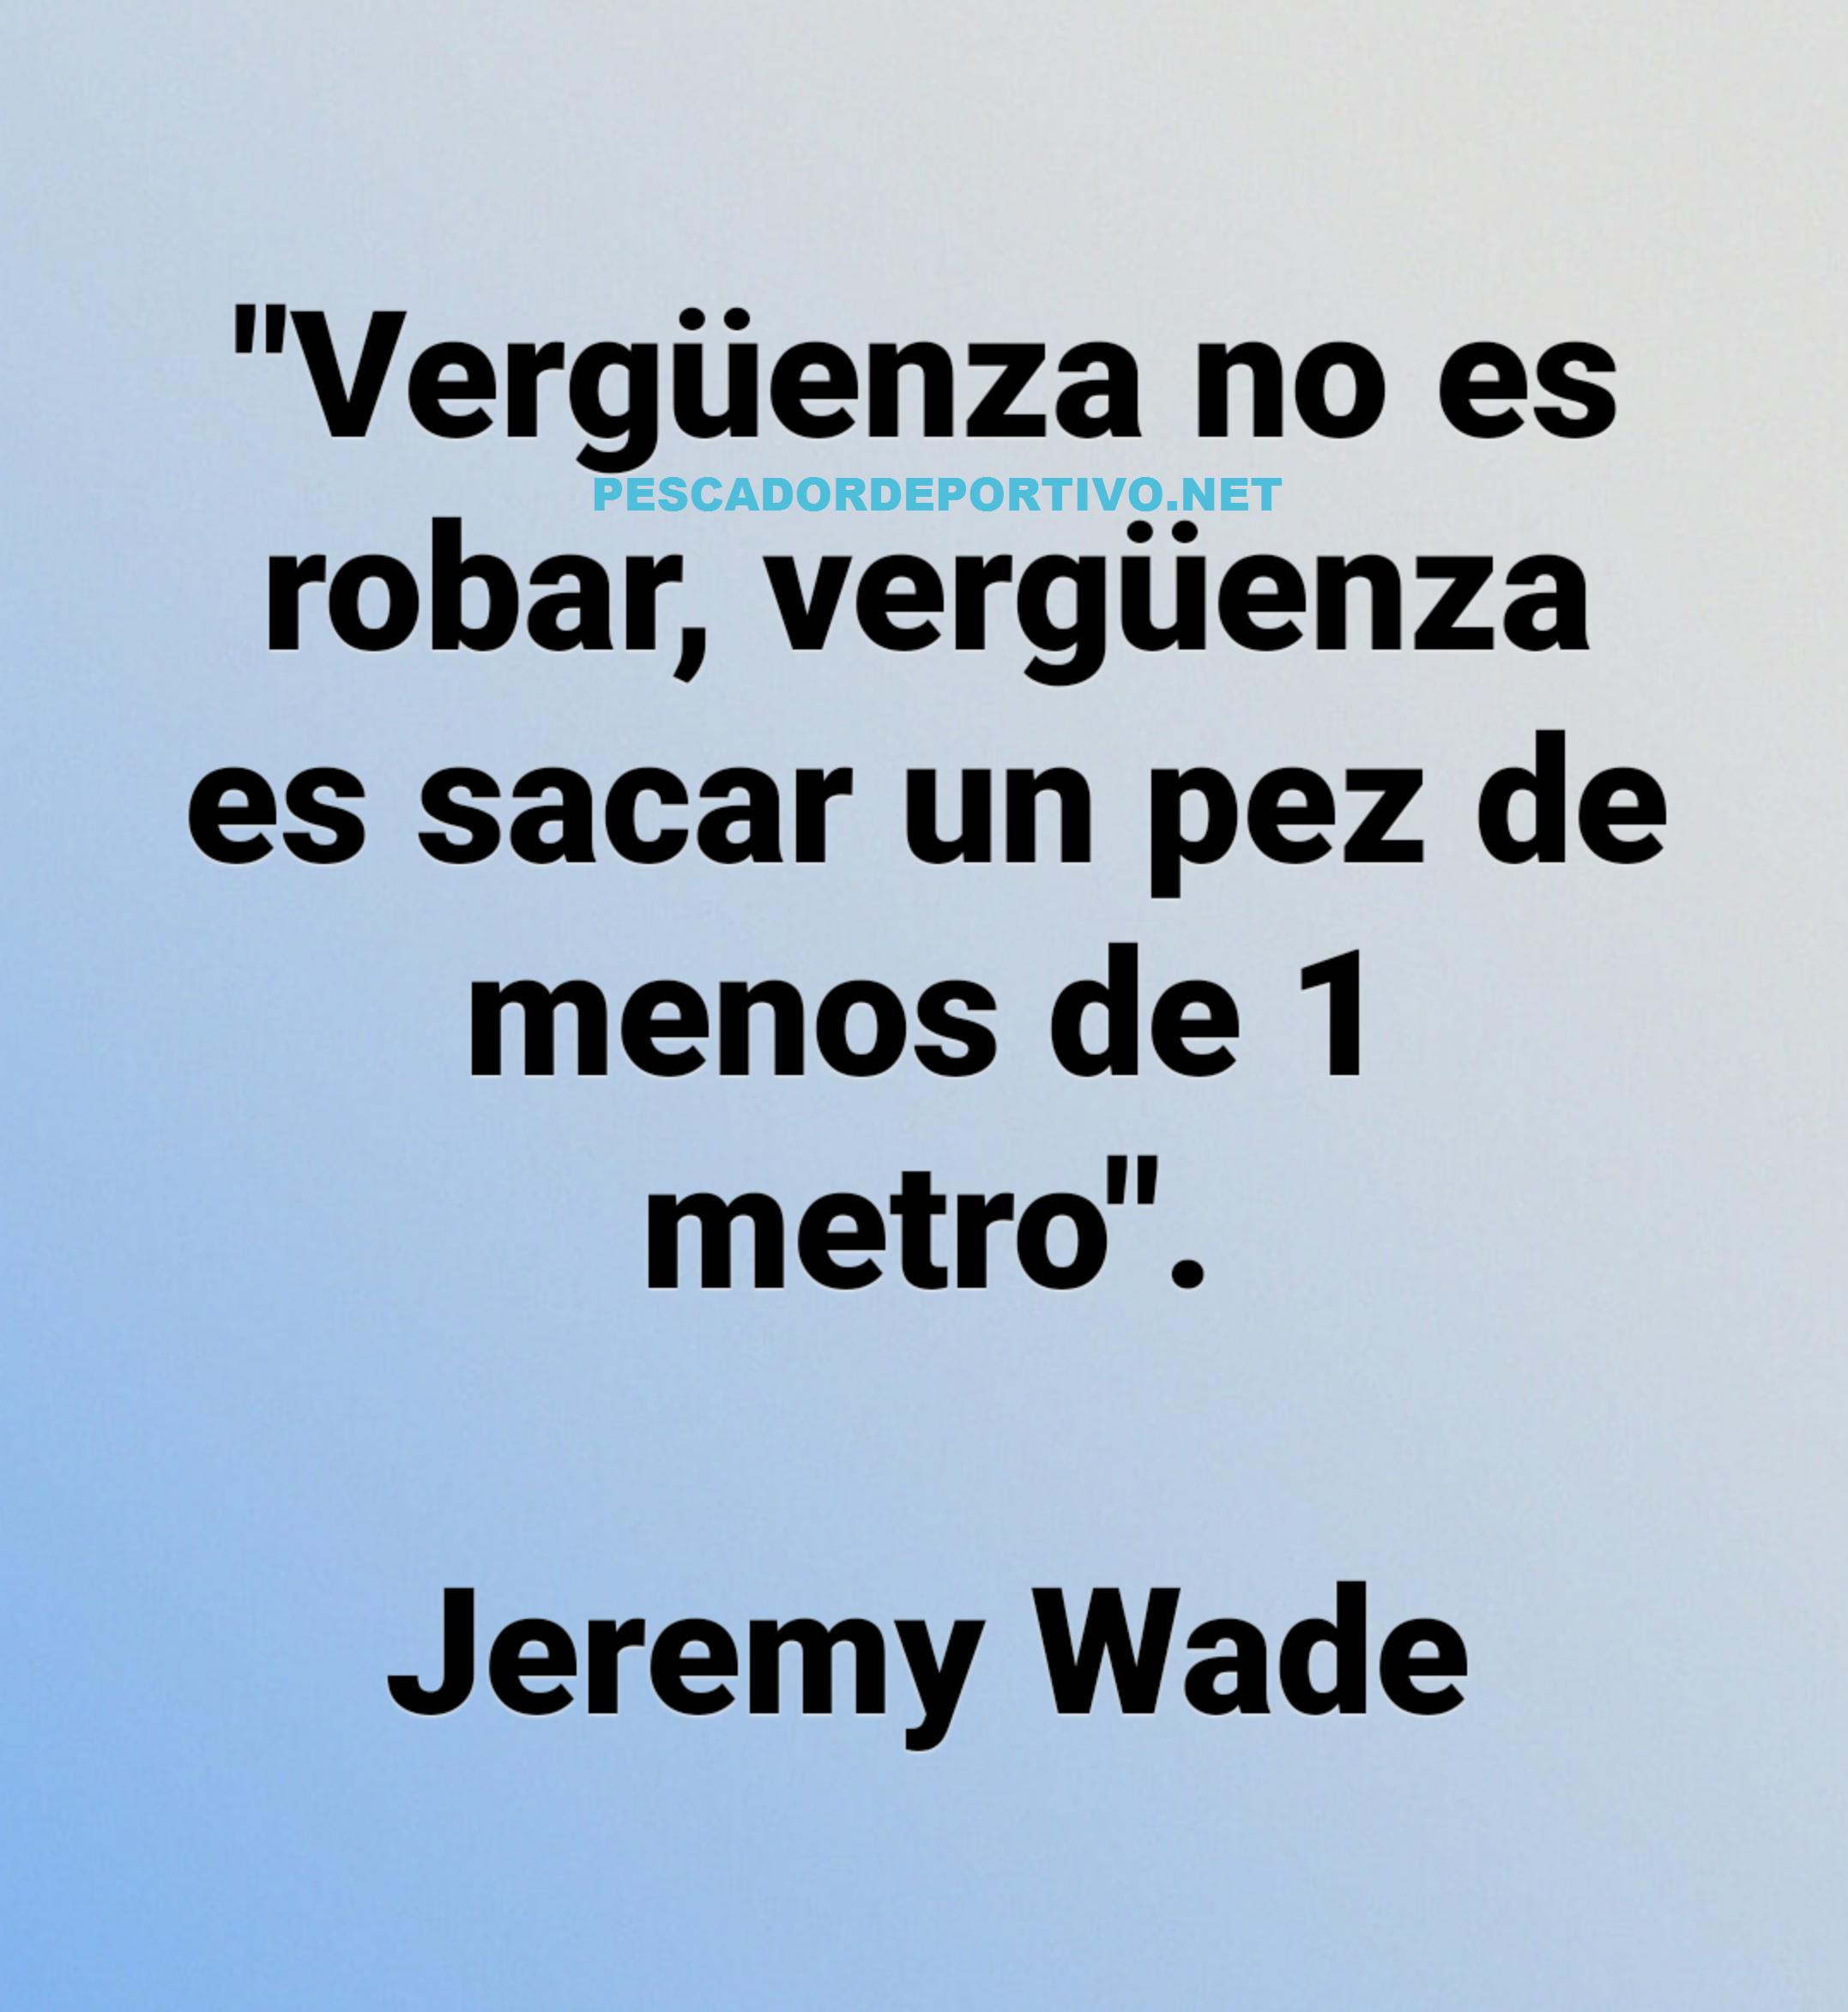 Meme Jeremy Wade 11